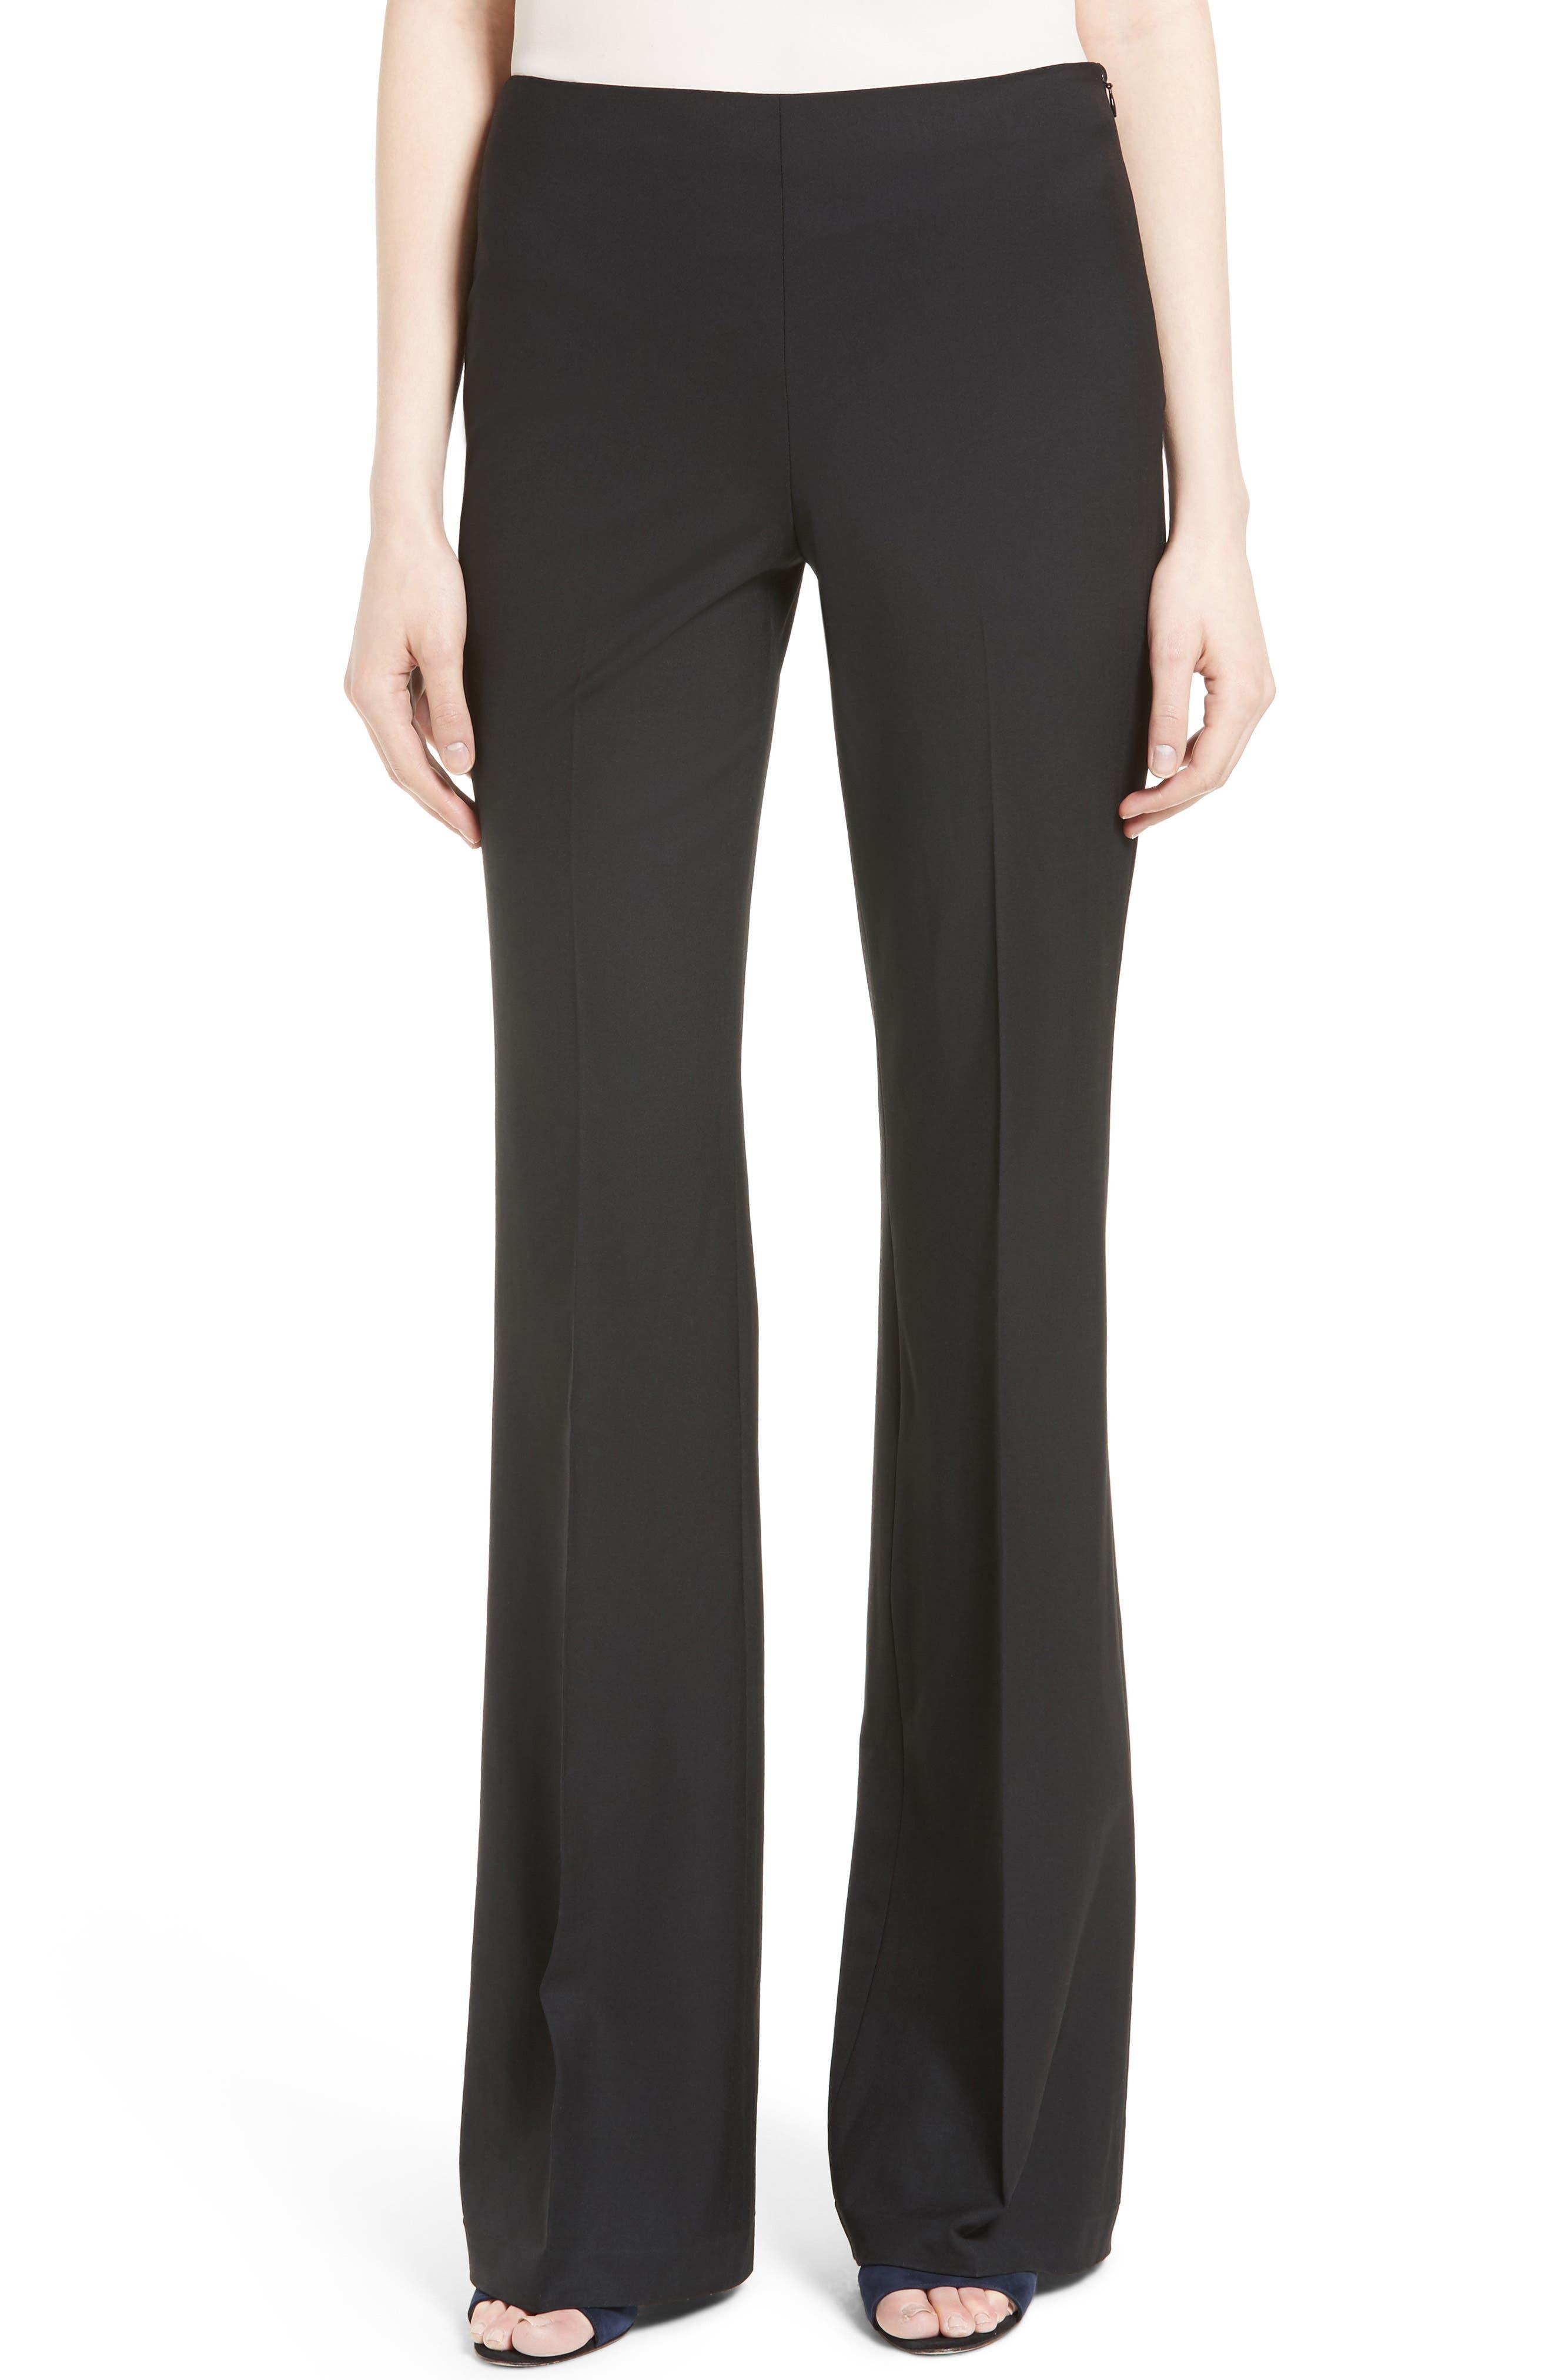 Demitria Flare Leg Good Wool Suit Pants,                             Main thumbnail 1, color,                             001